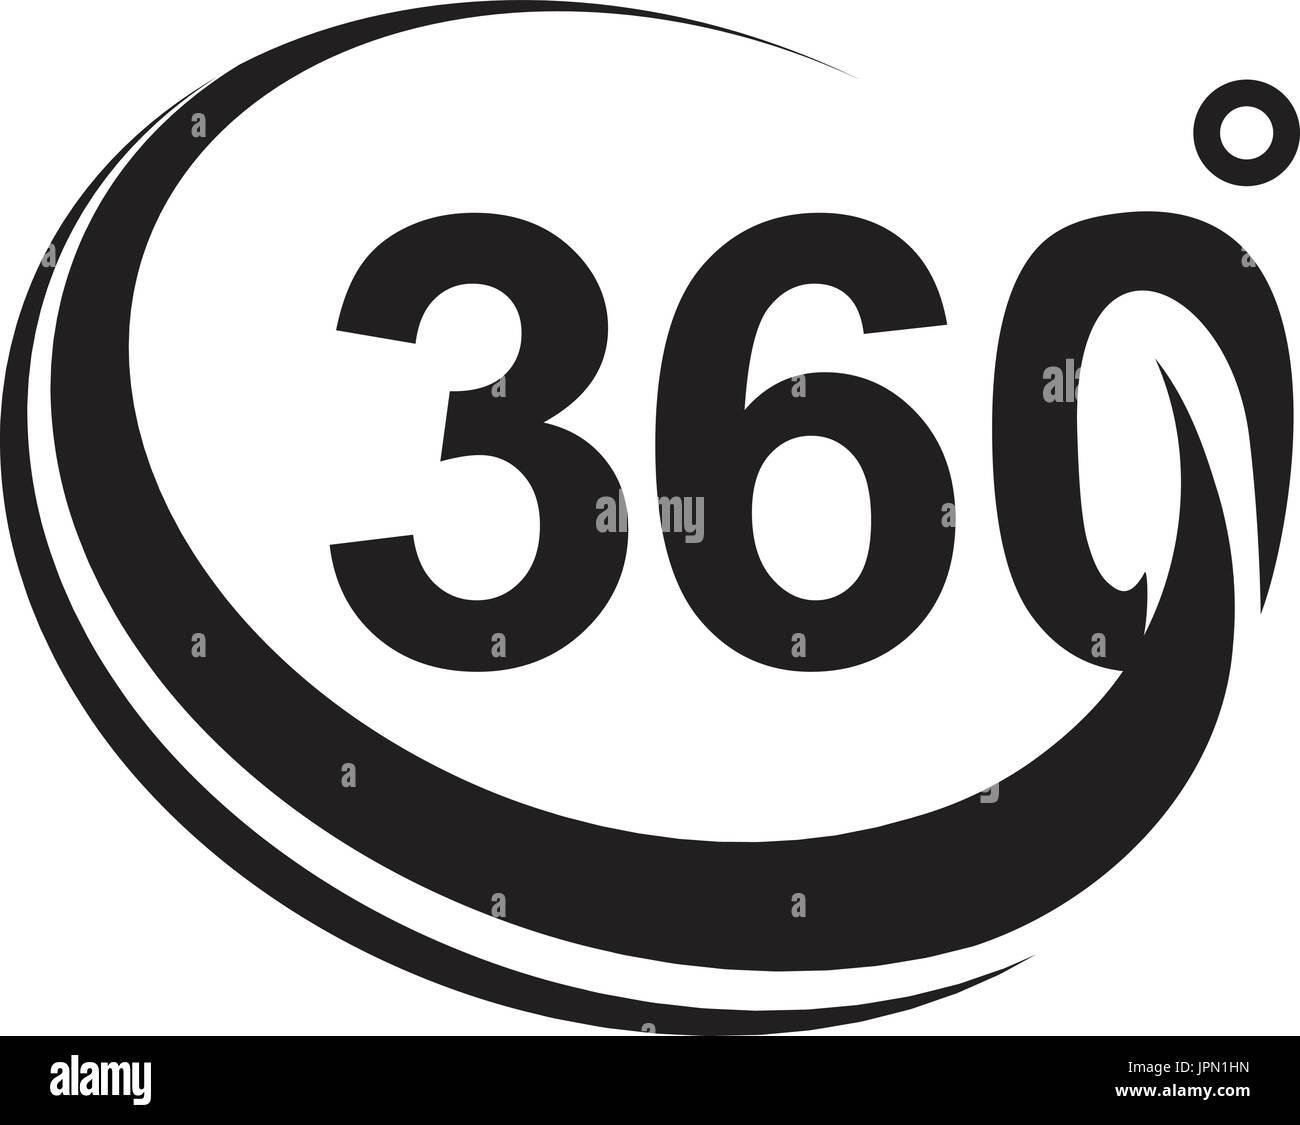 Degrees symbol stock photos degrees symbol stock images alamy 360 degree black version icon design isolated on white background stock image biocorpaavc Choice Image